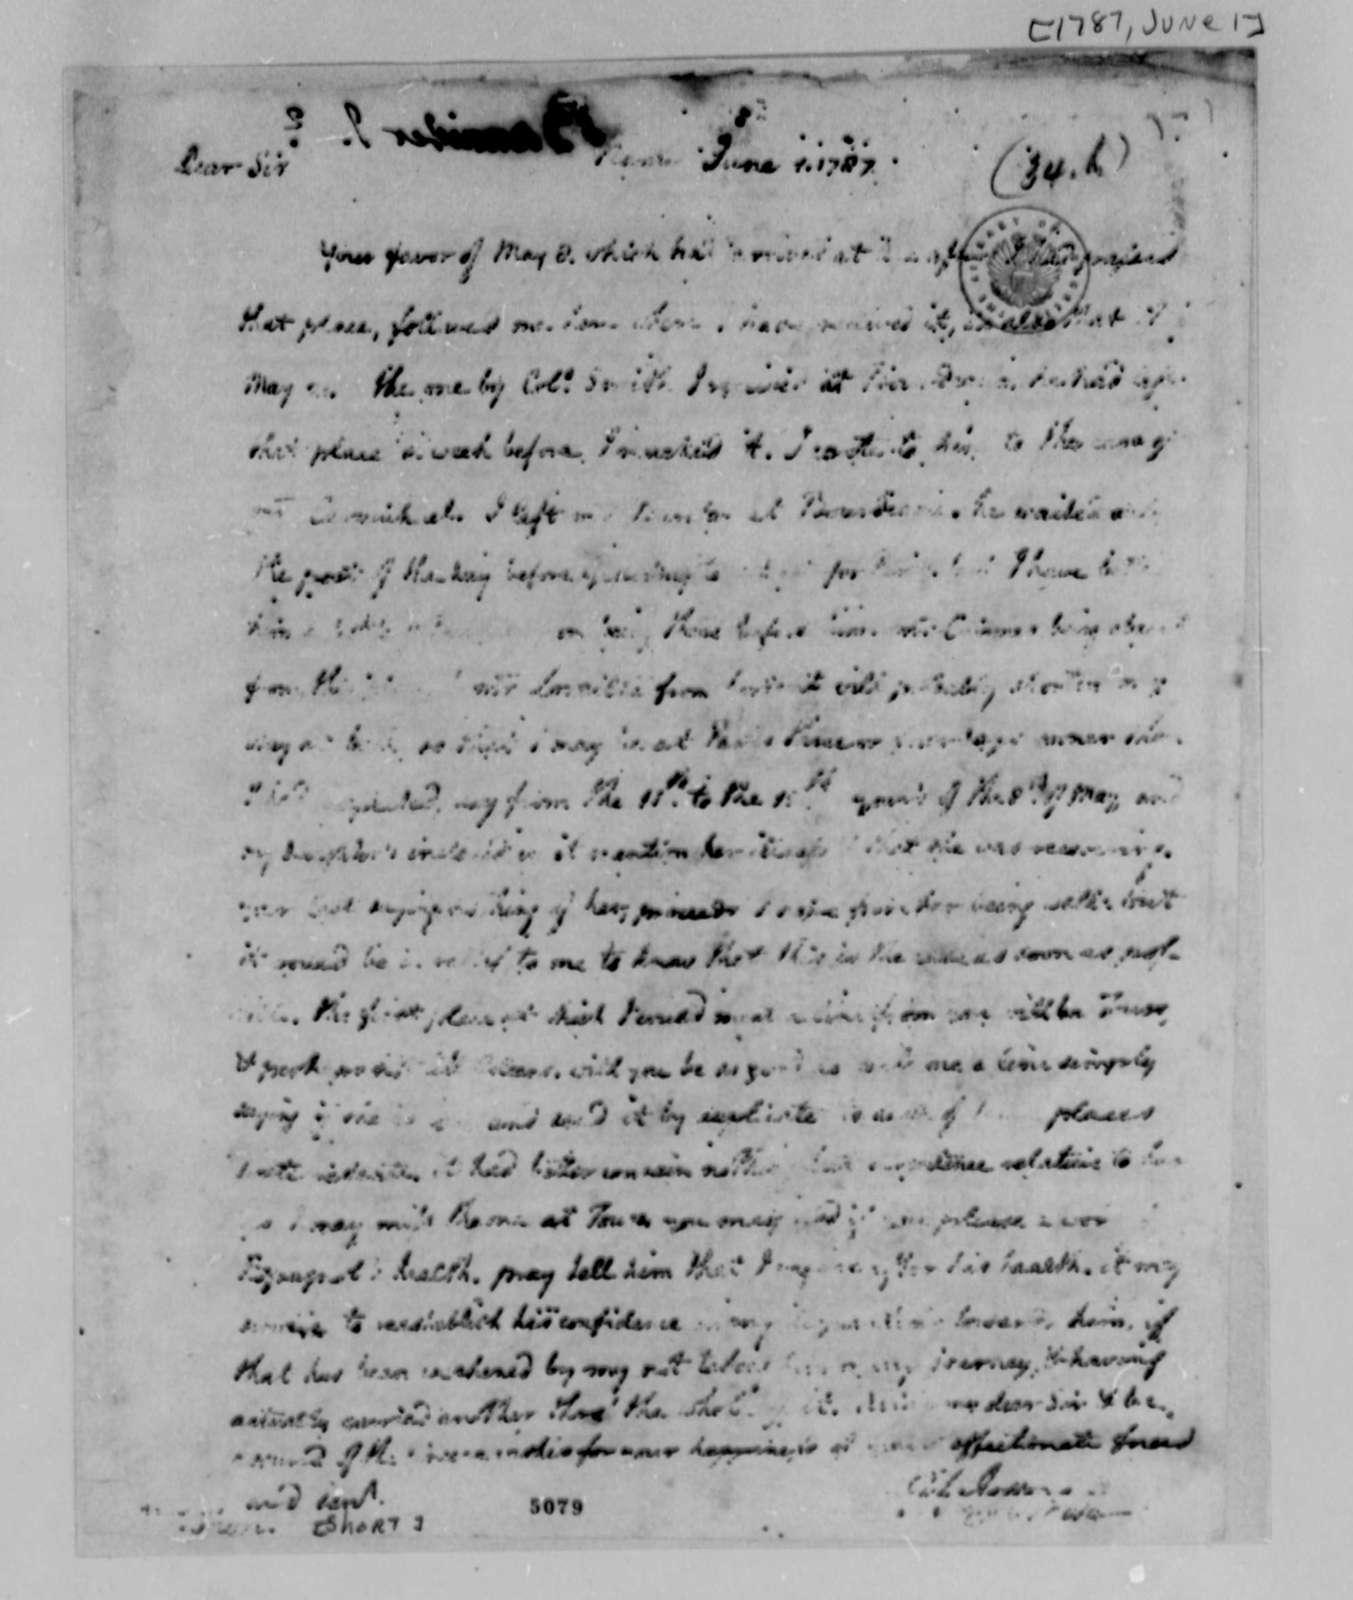 Thomas Jefferson to William Short, June 1, 1787